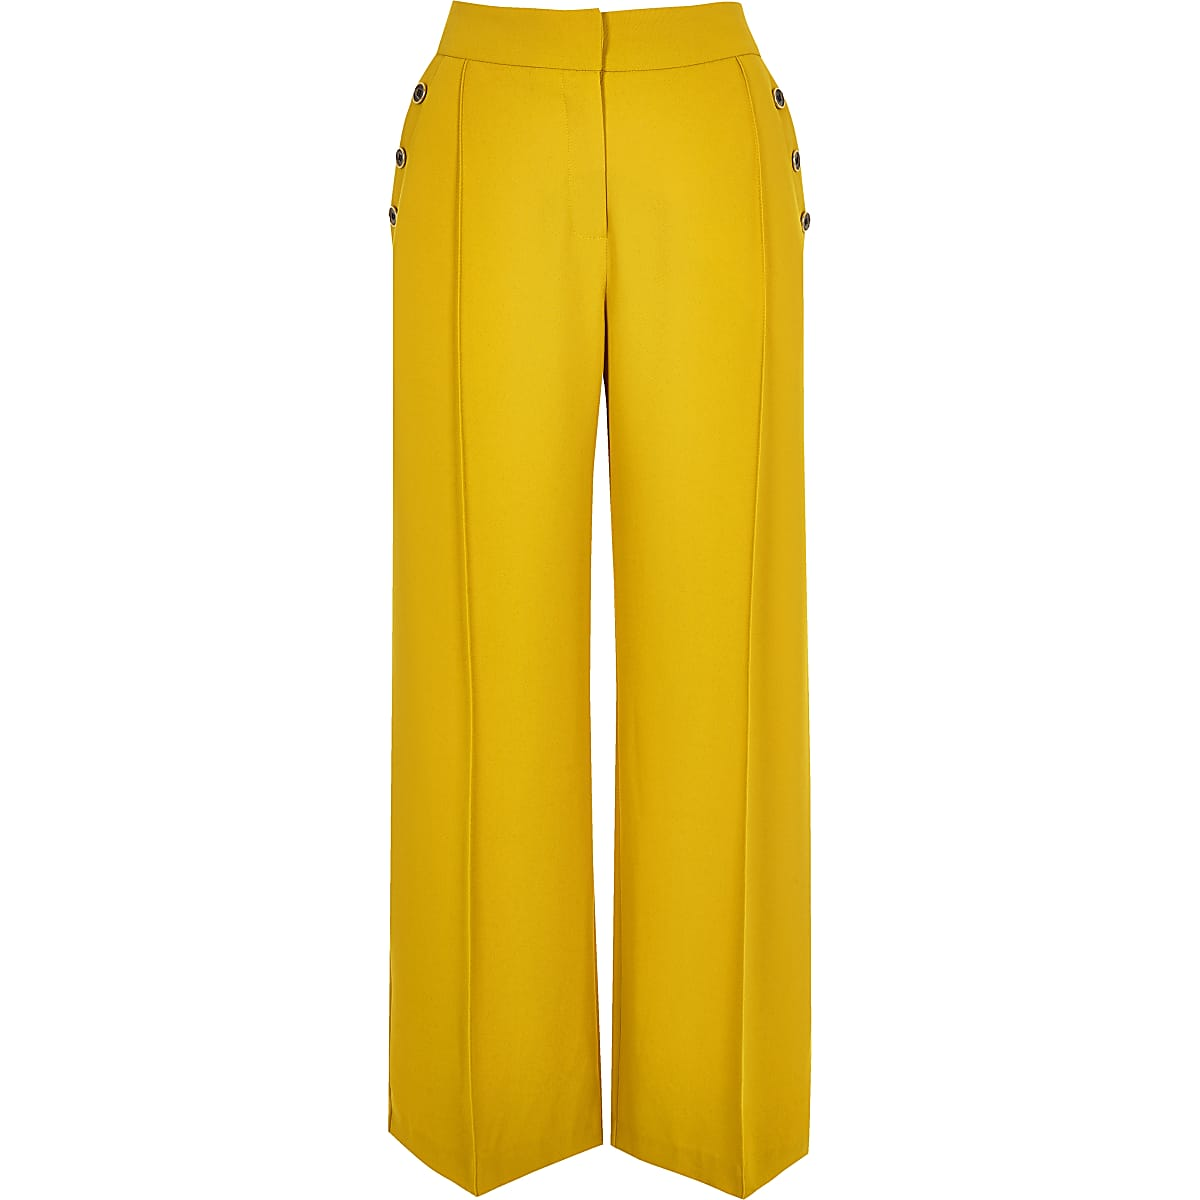 Petite yellow button wide leg trousers